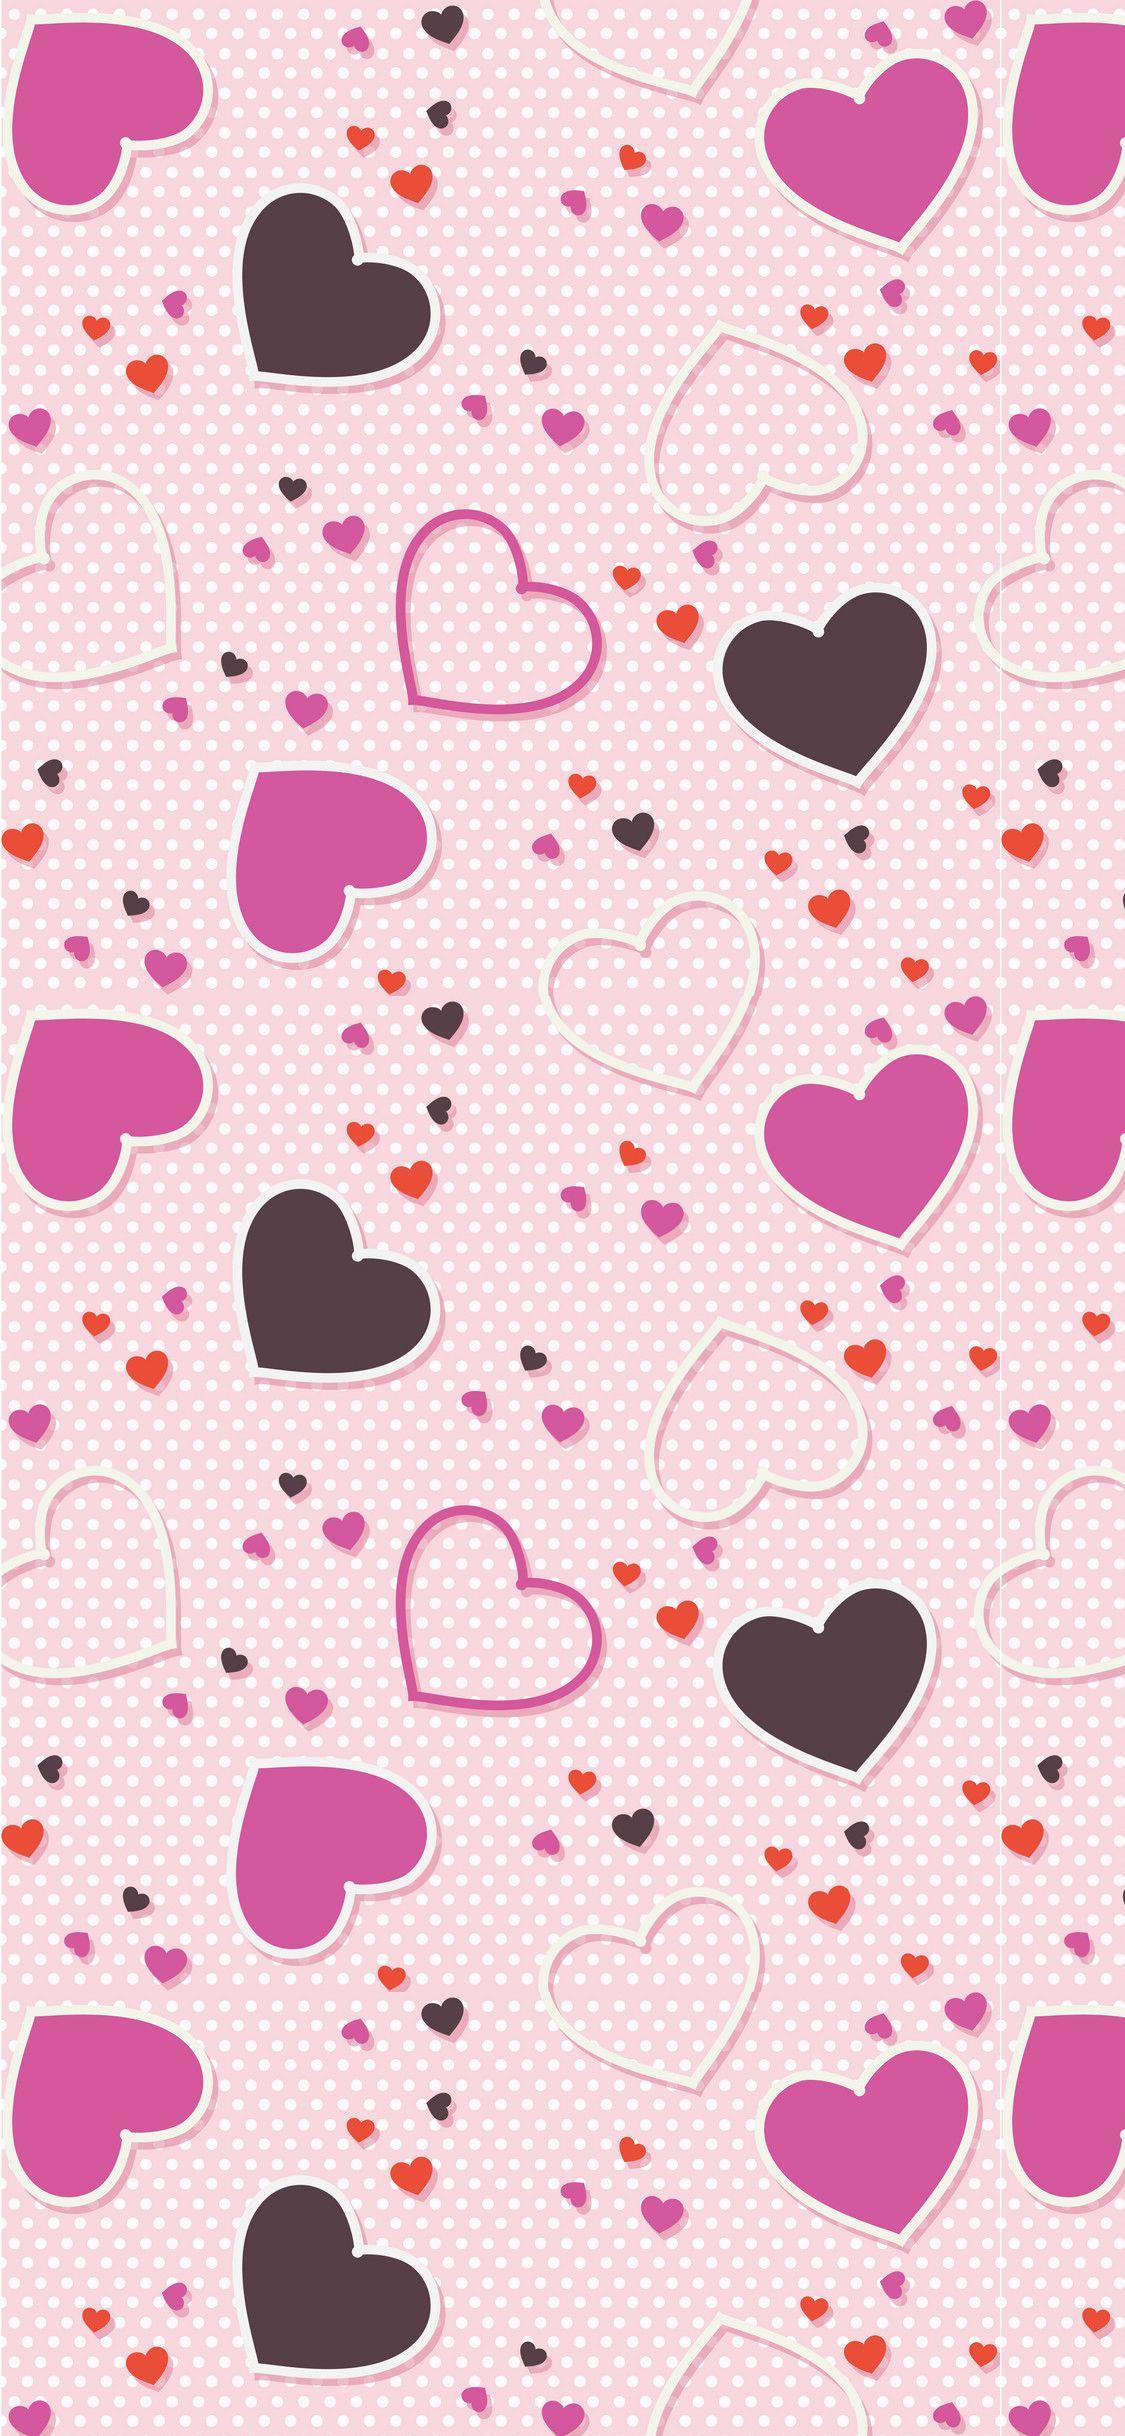 40 Ideas For This Super Cute Wallpaper Tumblr Iphone Free Stock Photos Hd Wallpaper Iphone Cute Cute Wallpapers Iphone Wallpaper